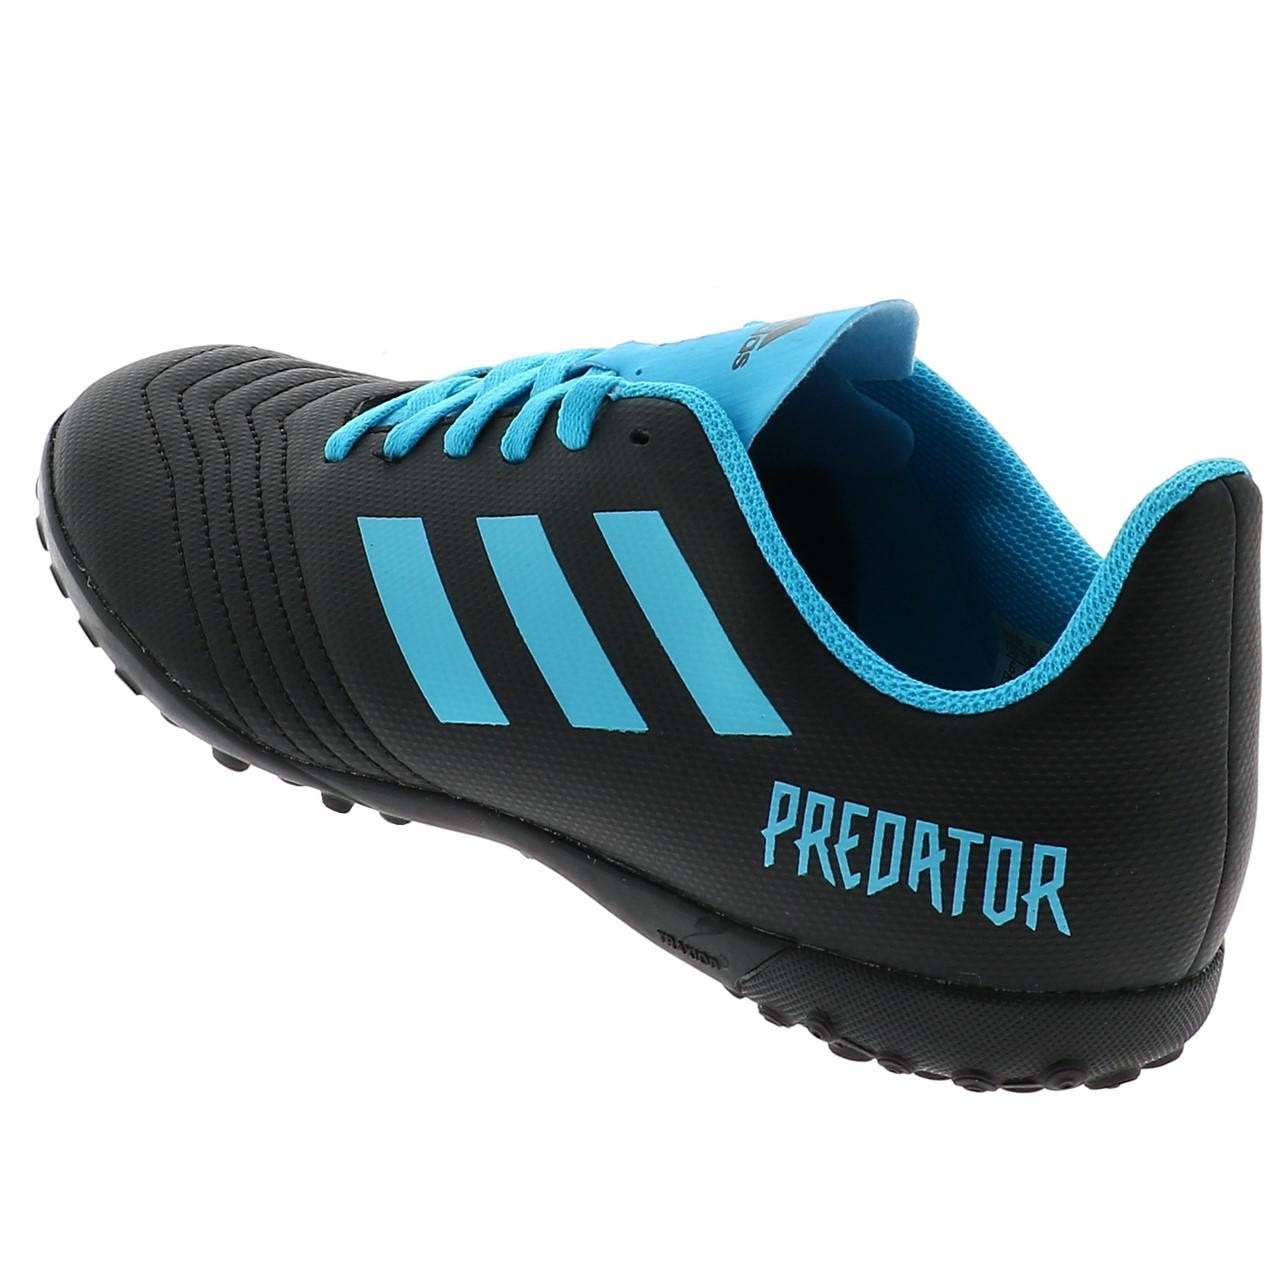 Football-Shoes-Stabilized-Adidas-Predator-19-4-Tf-Jmoule-Jr-Black-42177-N thumbnail 3